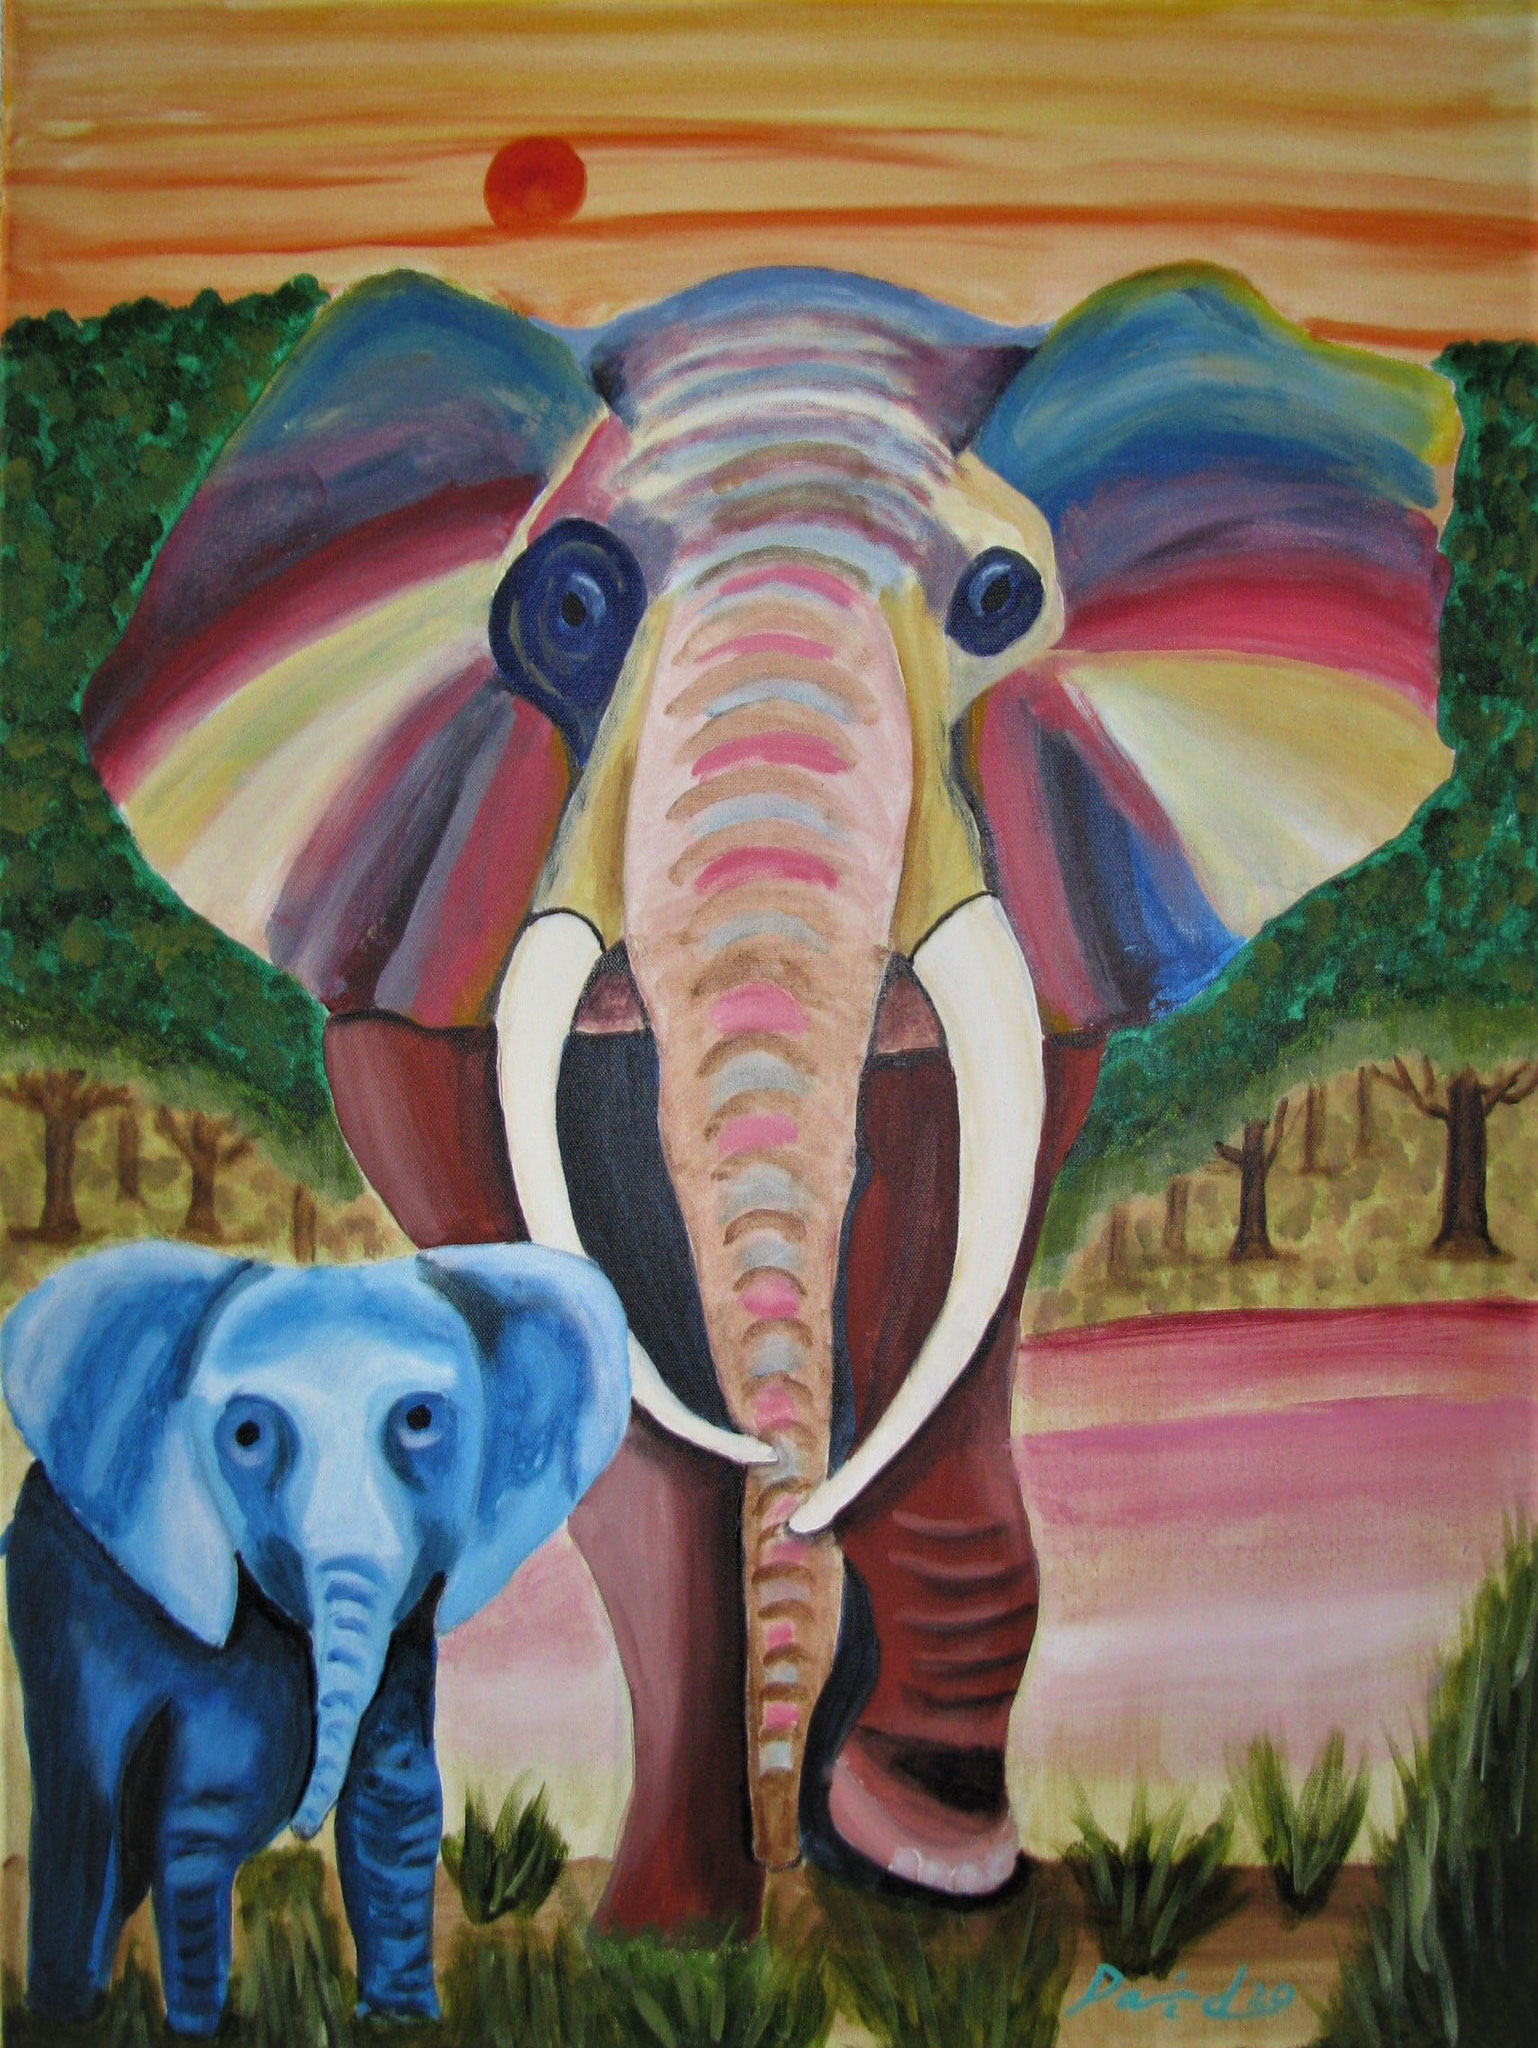 Elefanten, 60 cm x 80 cm, Acrylfarbe auf Leinwand